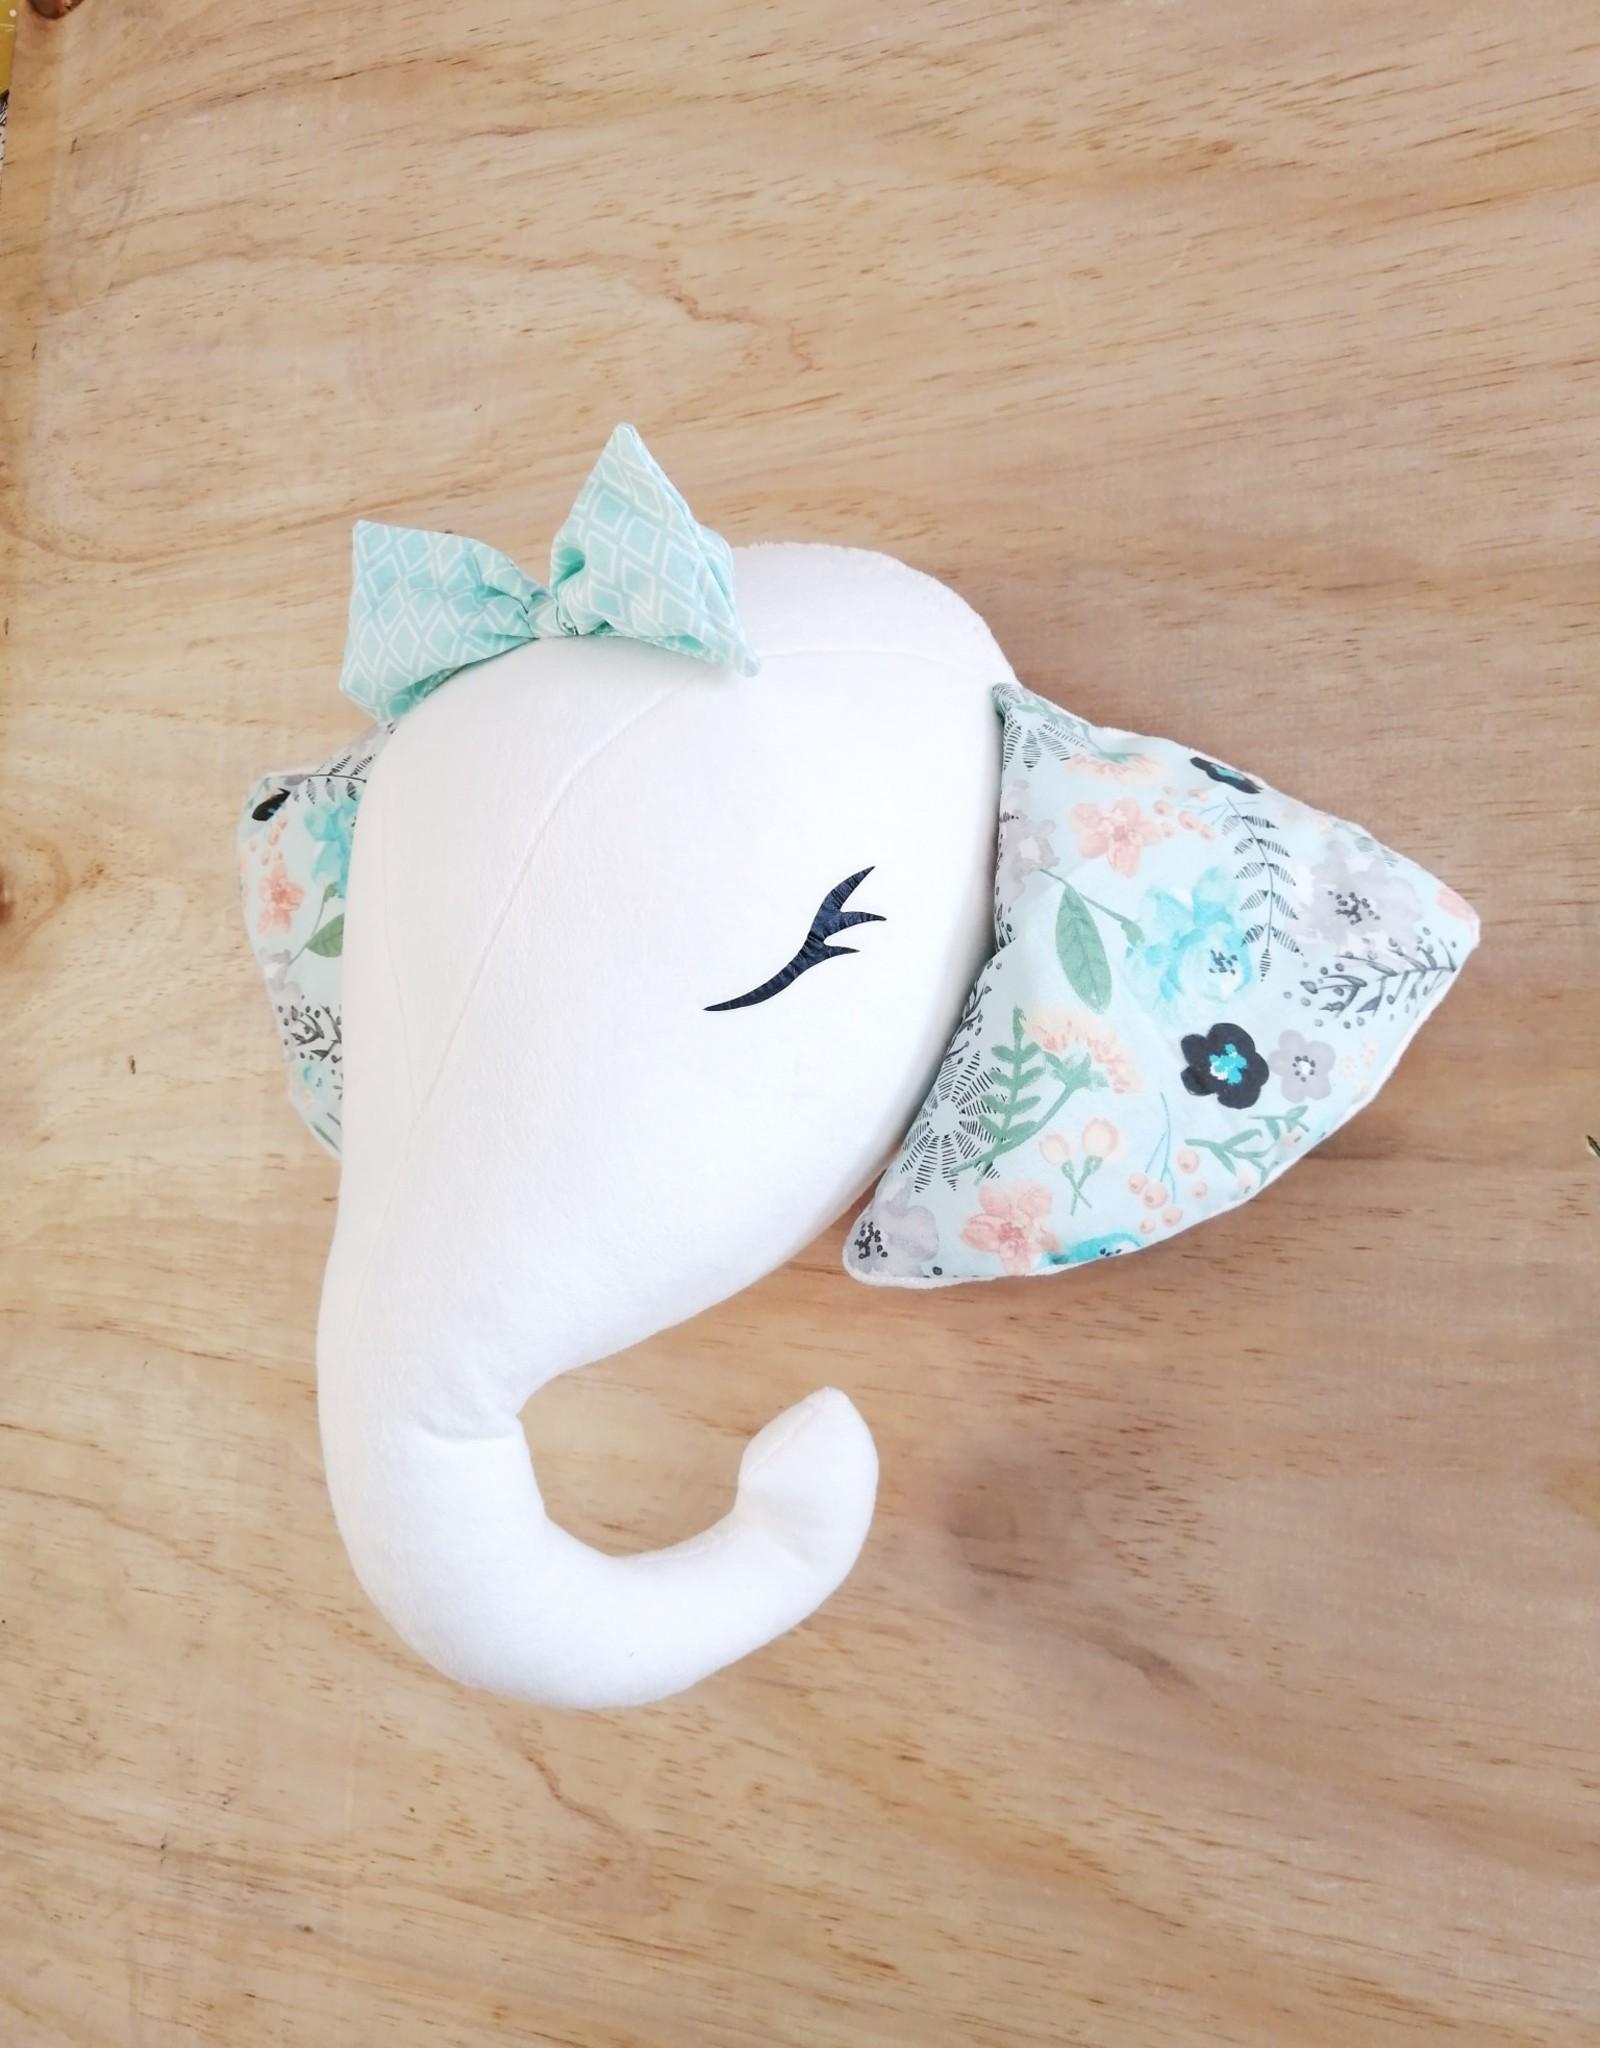 La petite renarde Wall hanging : Elephant with teal ears